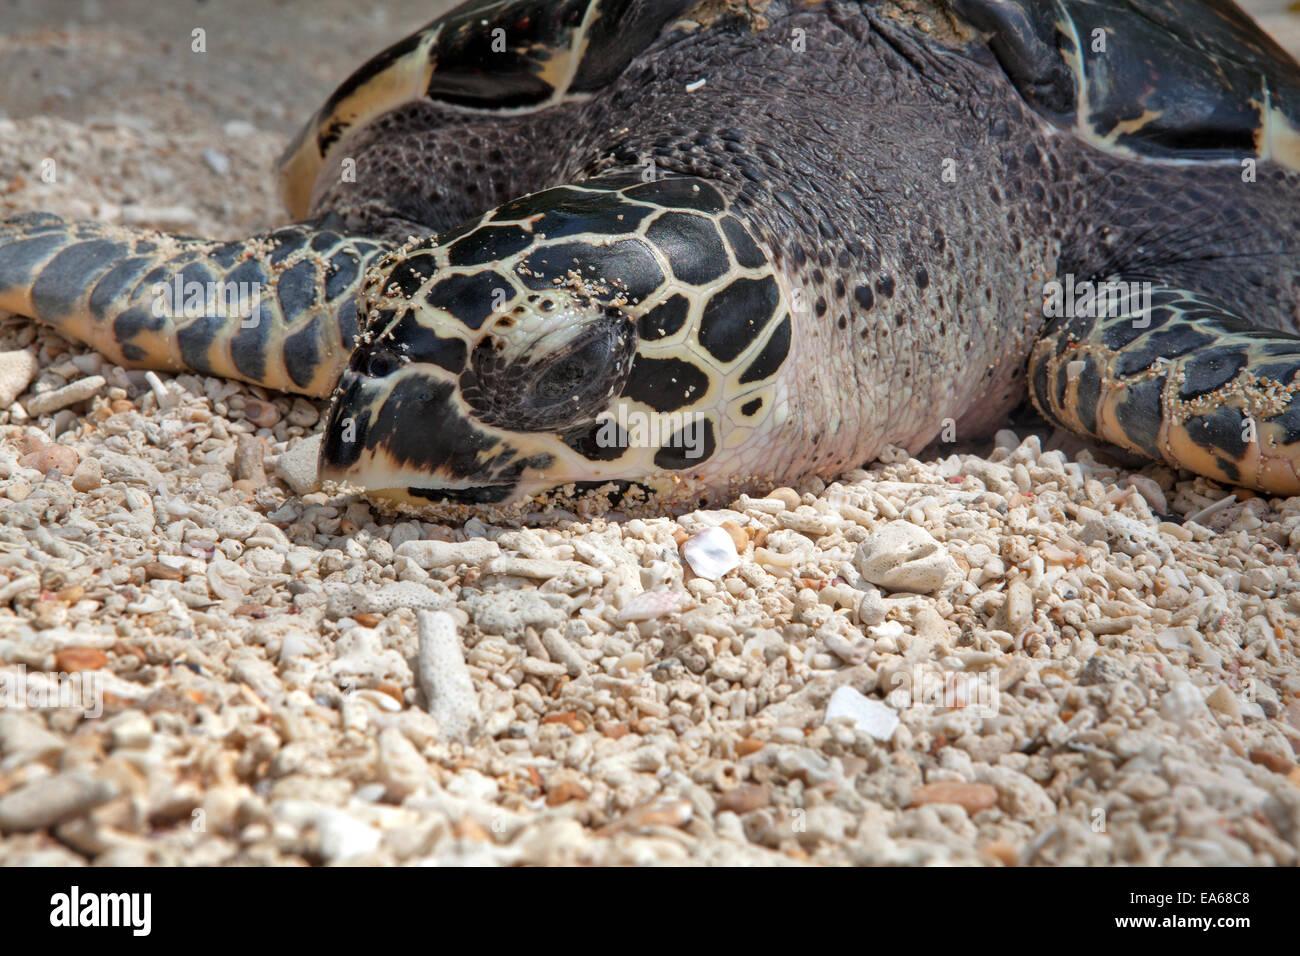 Green Sea Turtle, Chelonia mydas. Stock Photo